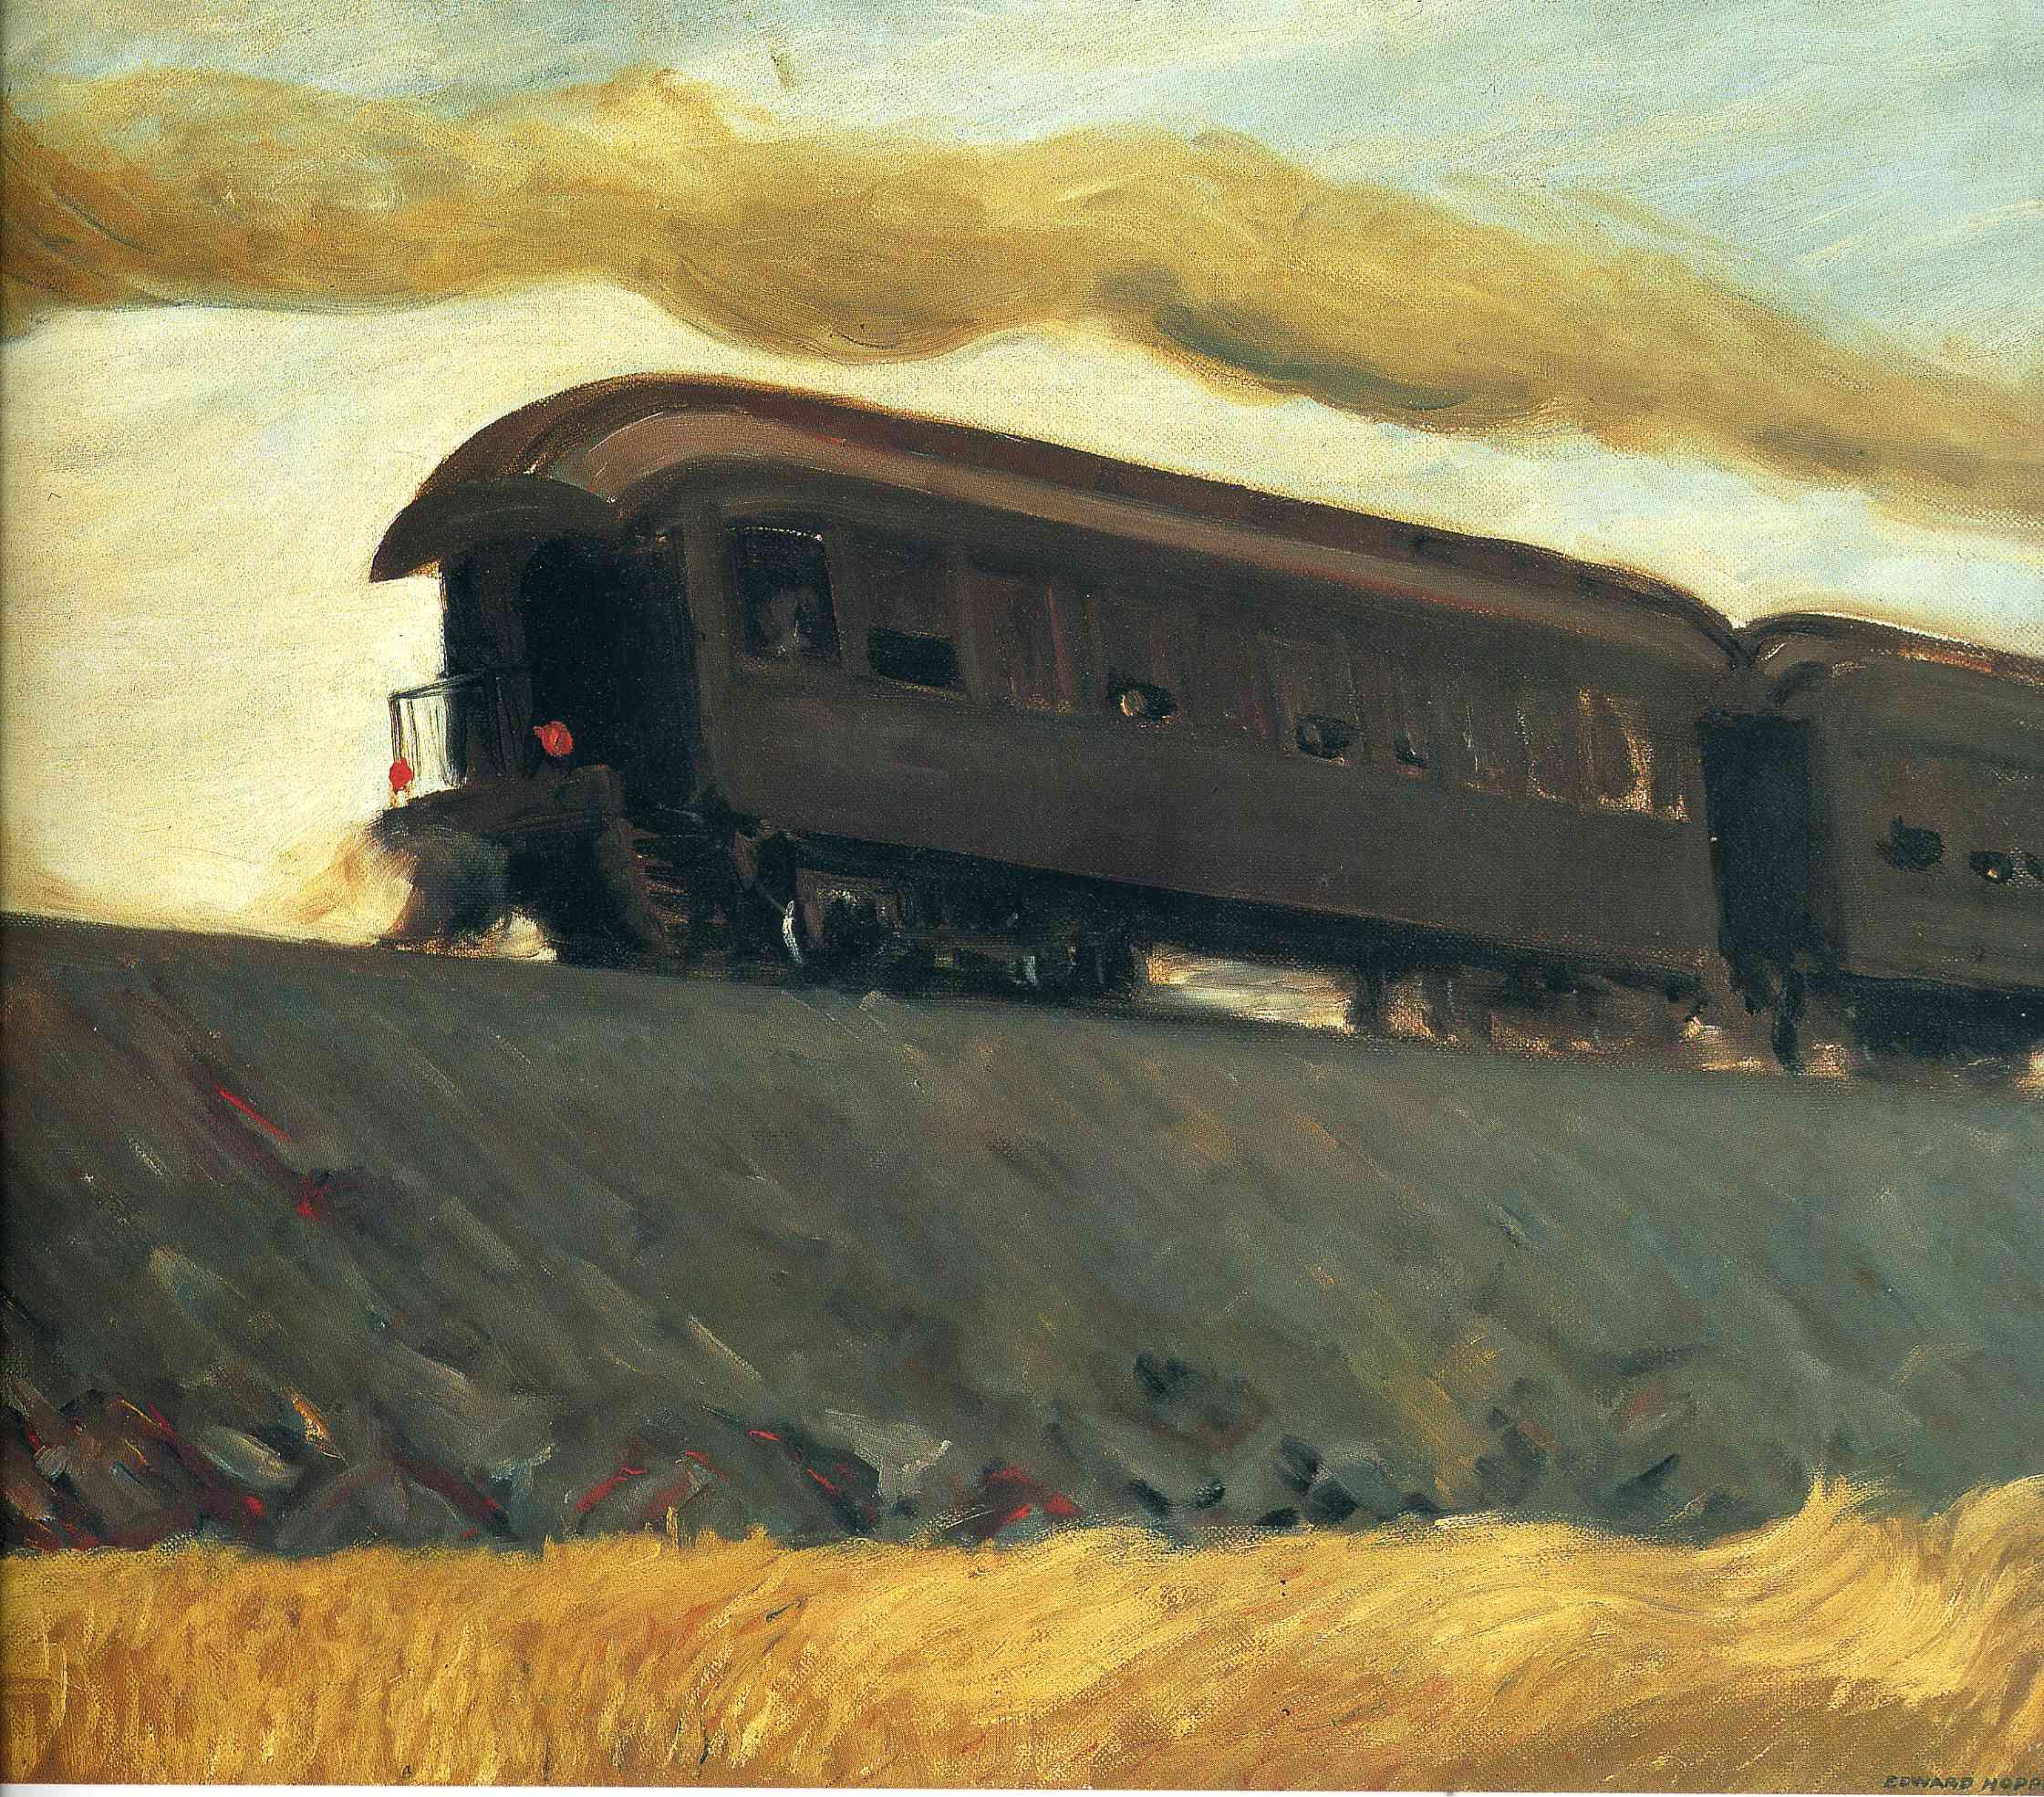 Railroad Train, 1908 - Edward Hopper - WikiArt.org